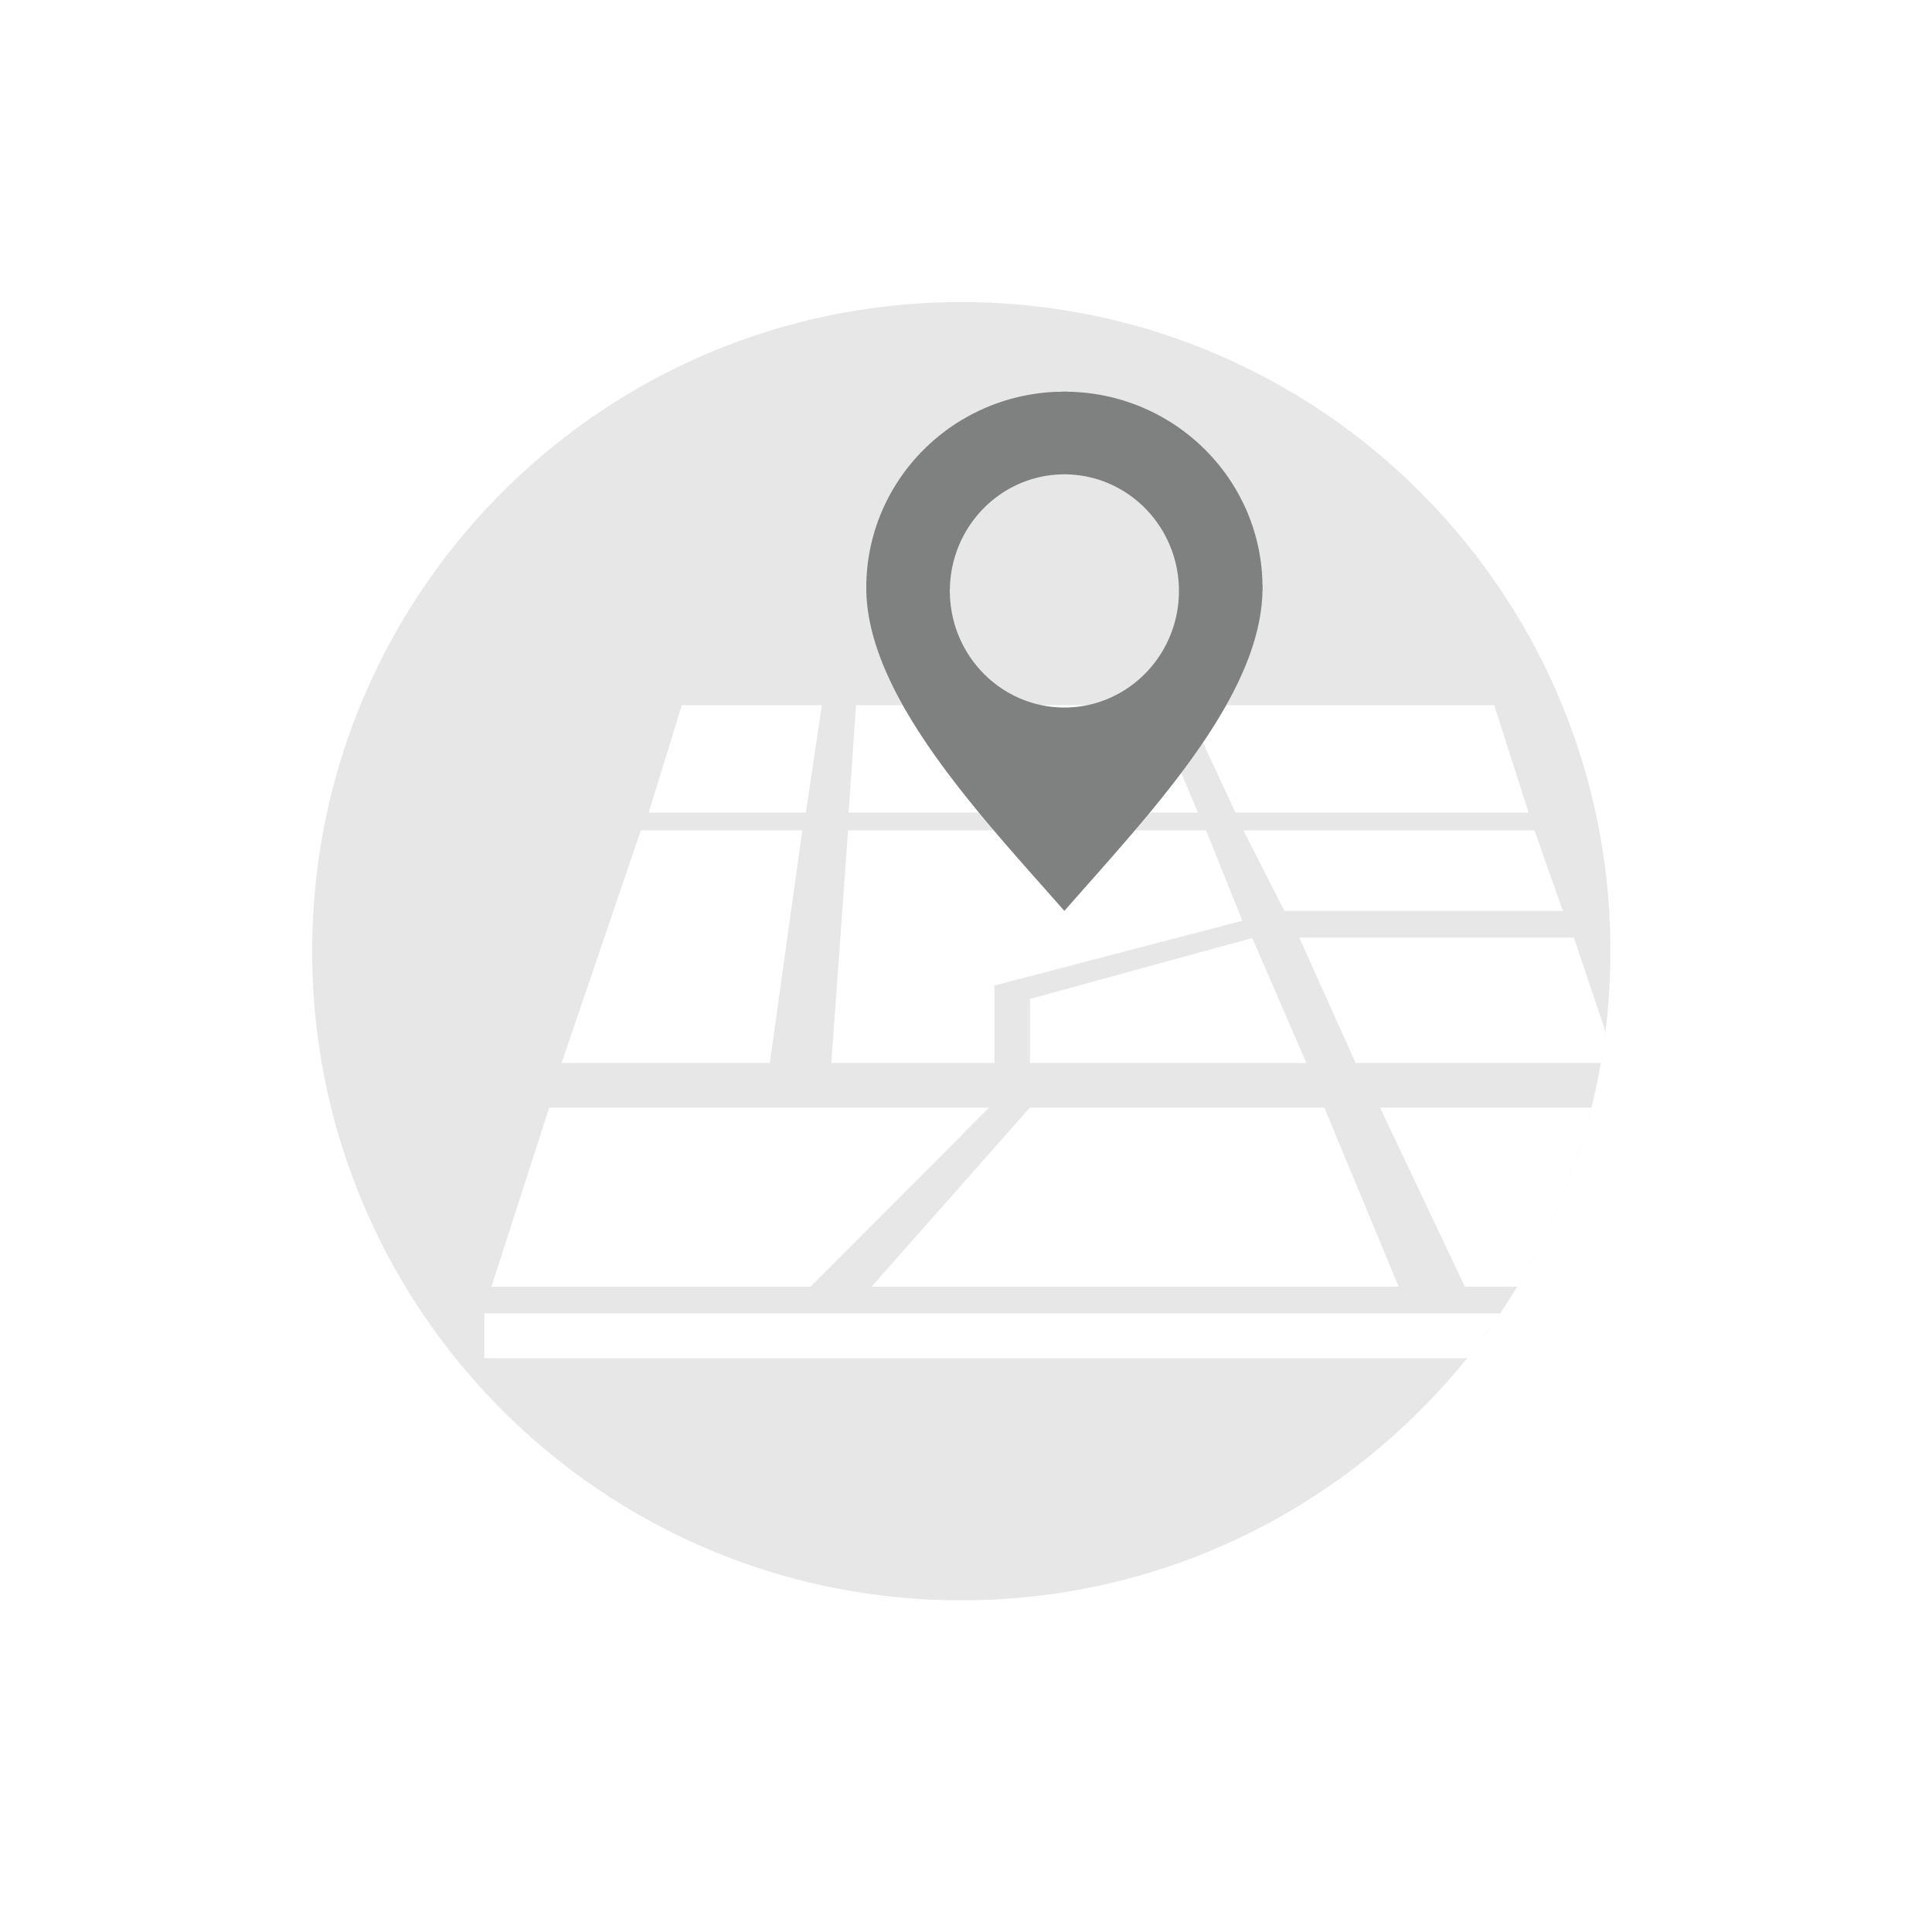 VSM_flat_icon-01.png